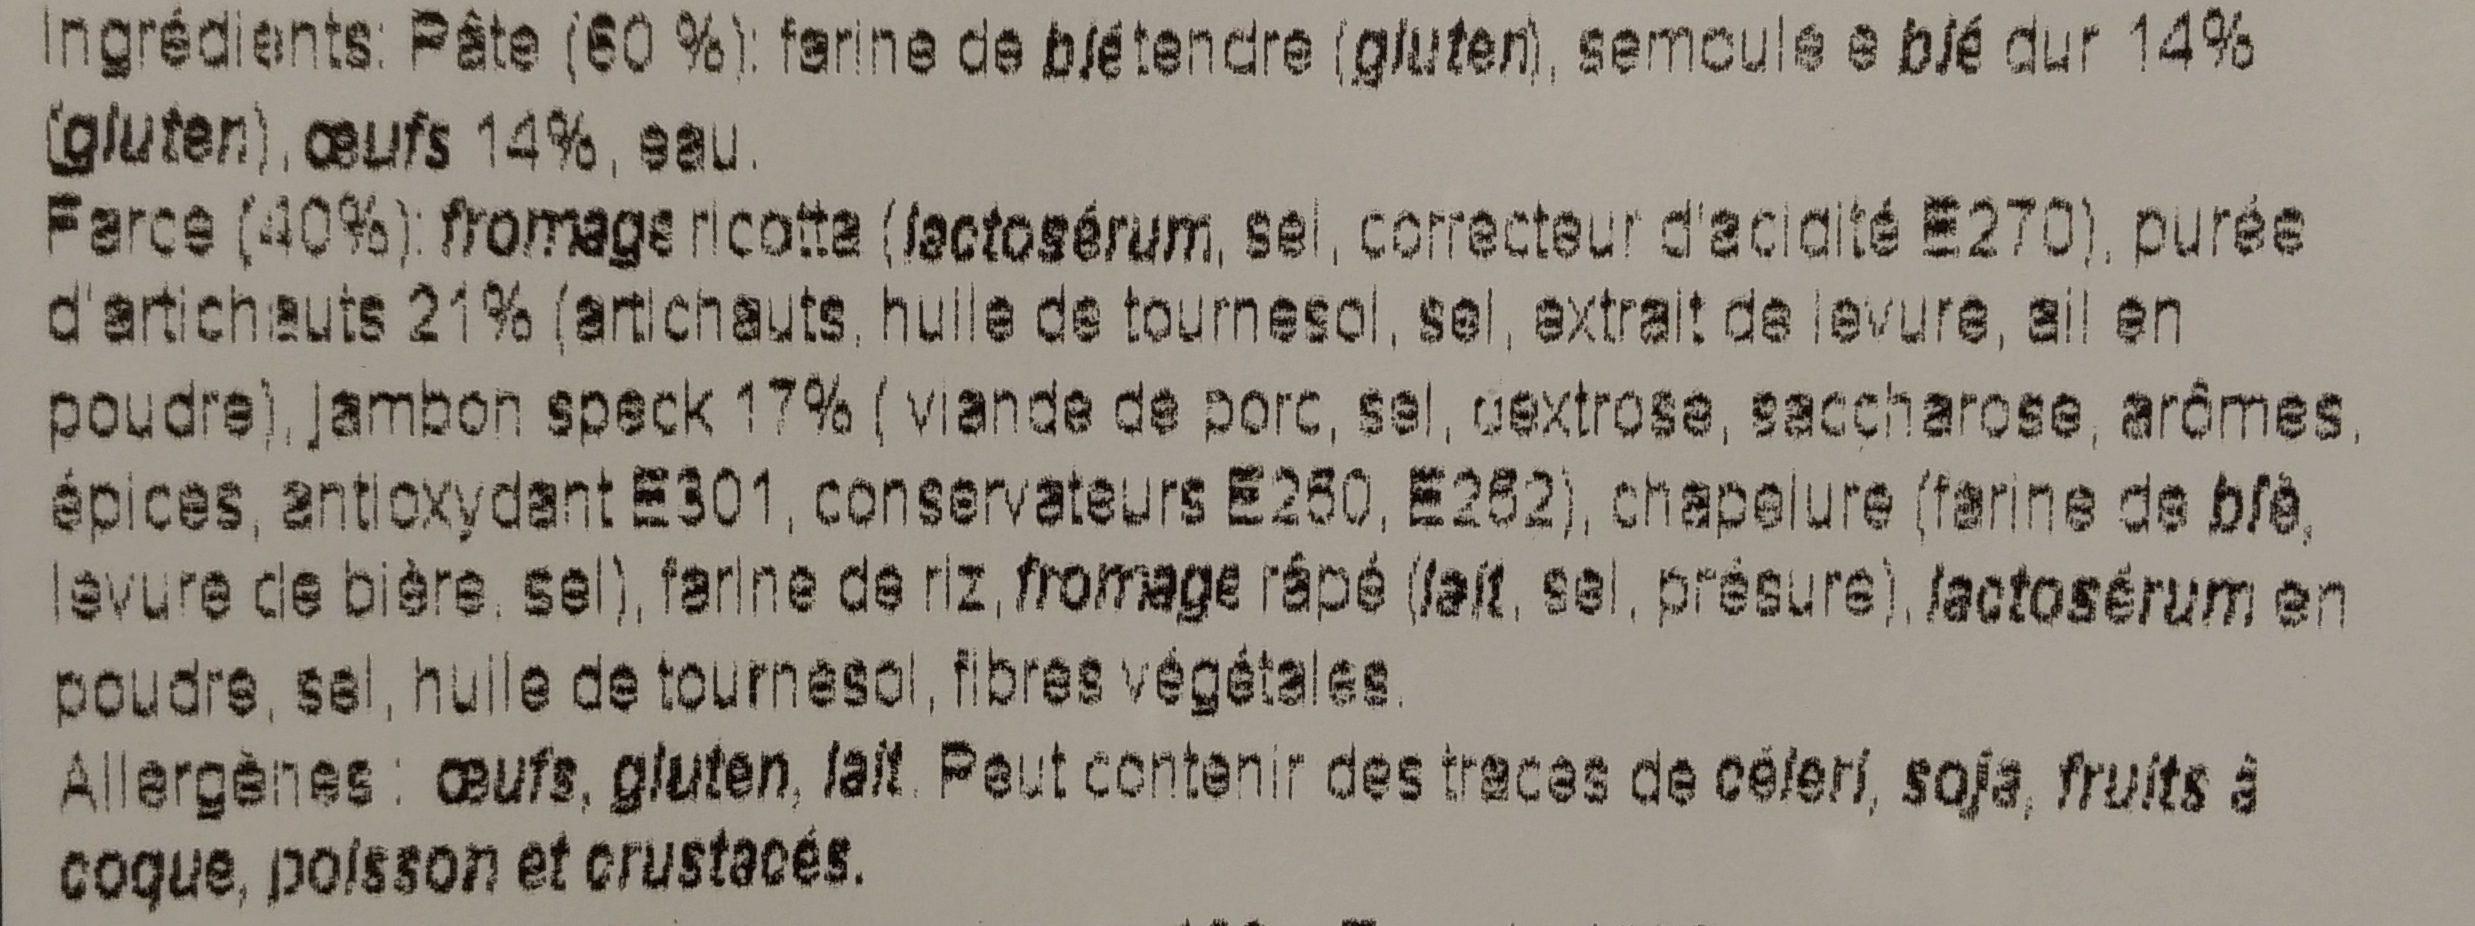 Tortelloni Carciofi e Speck - Ingrediënten - fr